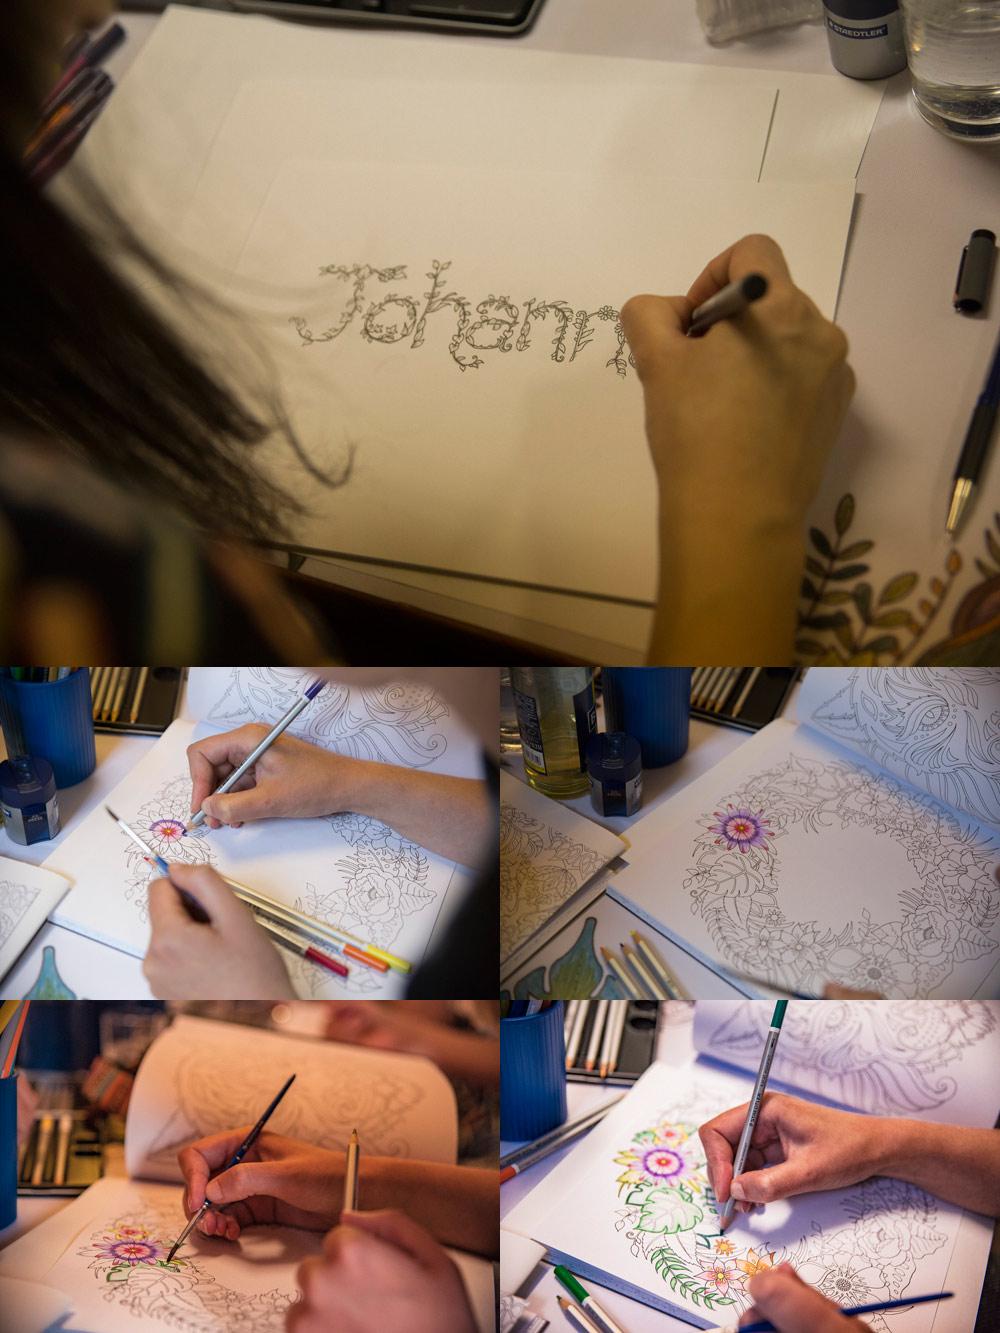 Adult Coloring Workshop mit Johanna Basford und Staedler - Kreativfiber